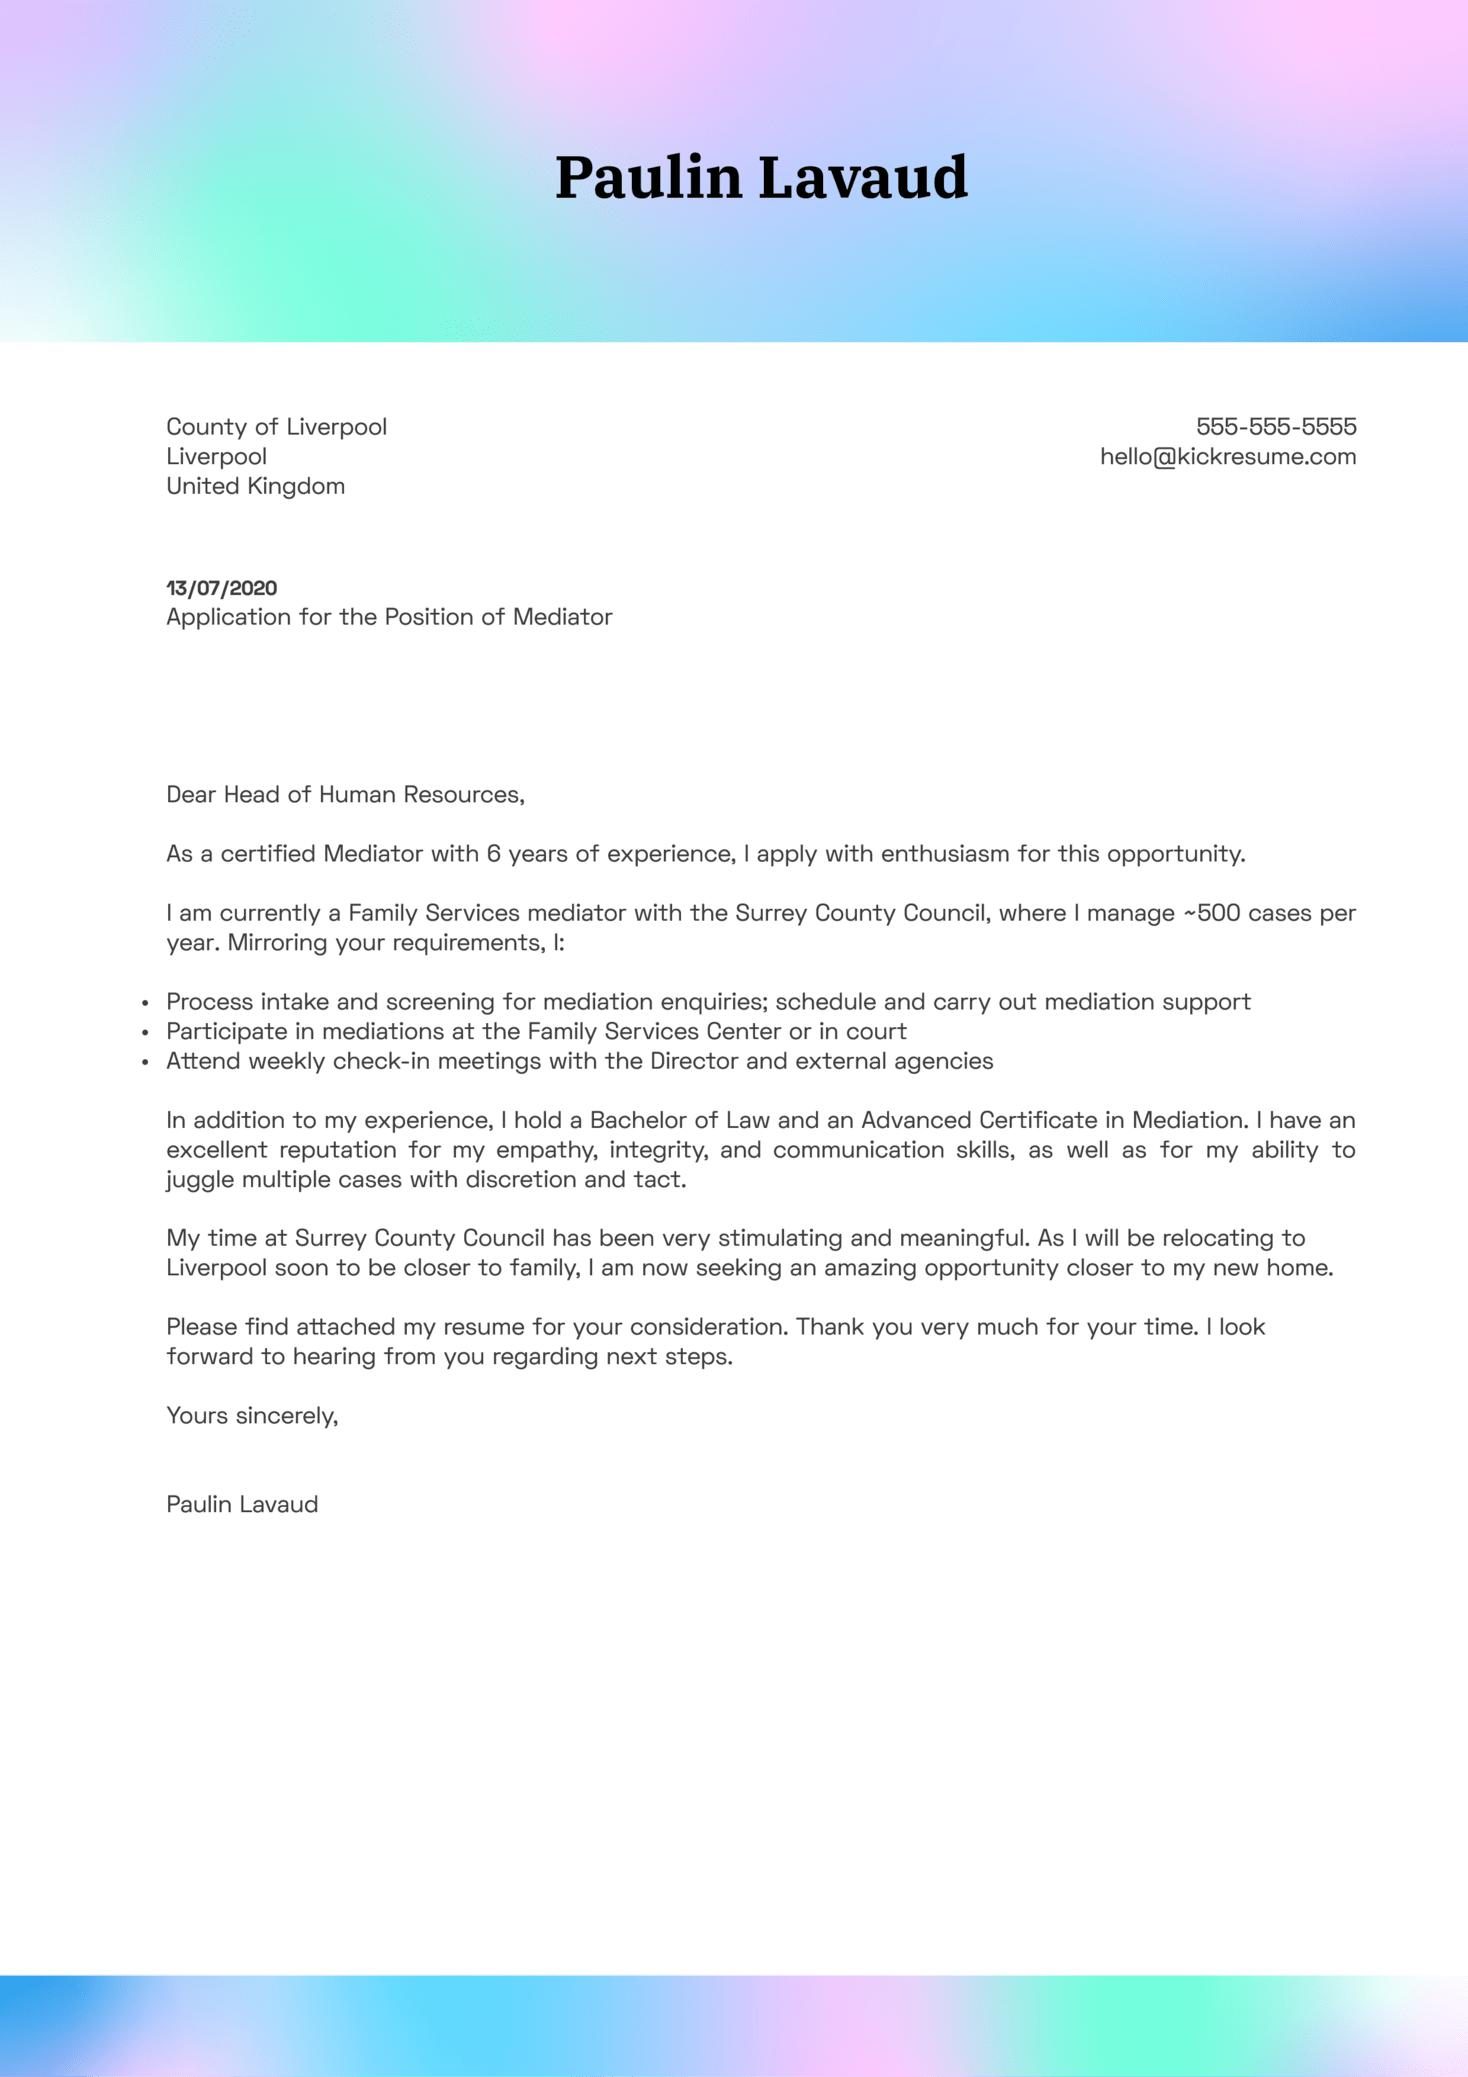 Mediator Cover Letter Example